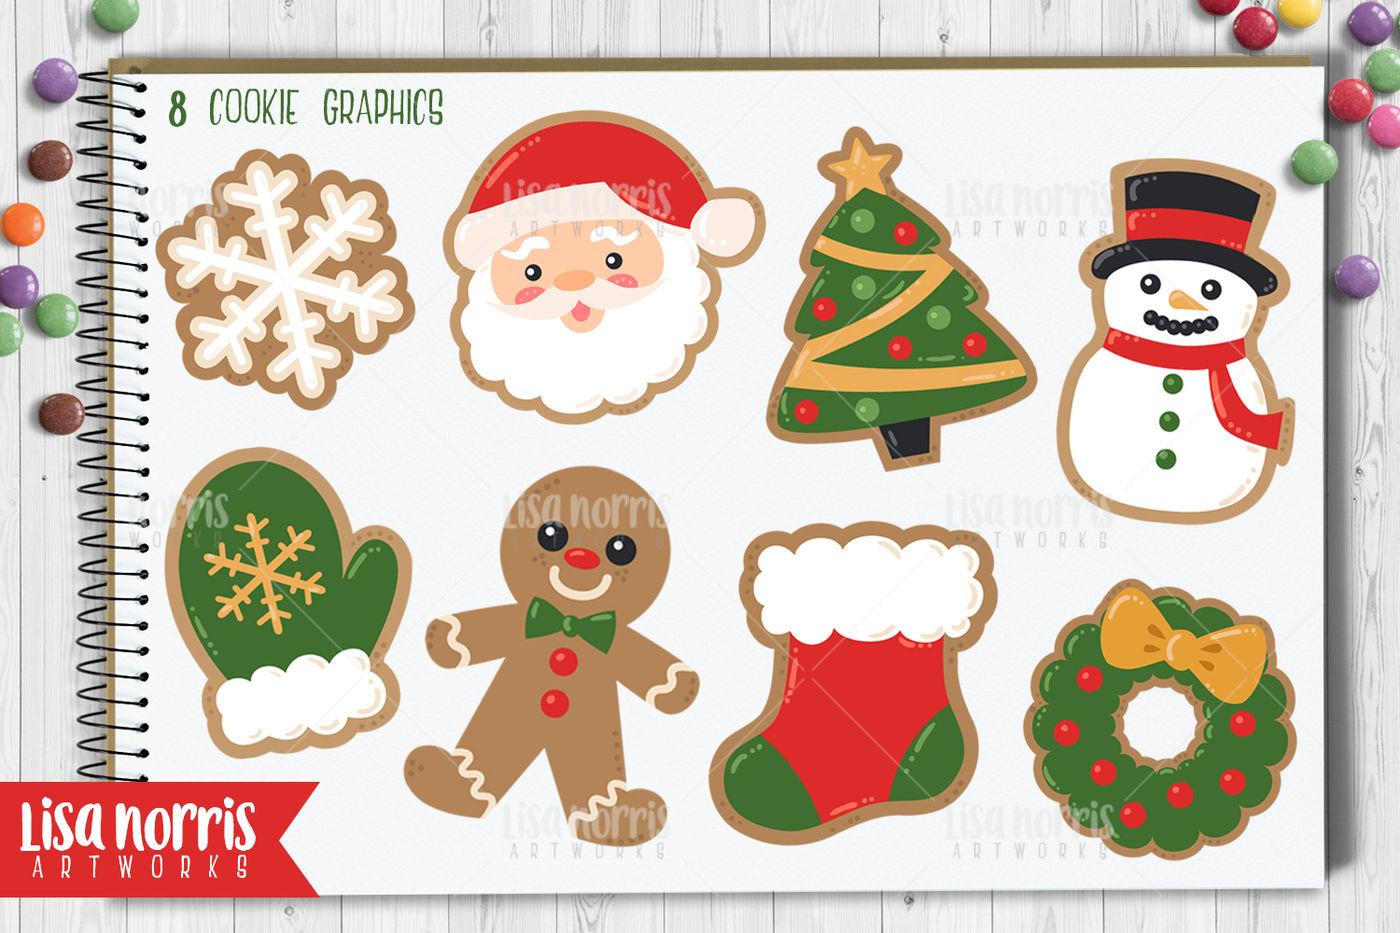 Christmas Cookies Clipart.Christmas Cookies Clip Art Graphics By Lisa Norris Artworks